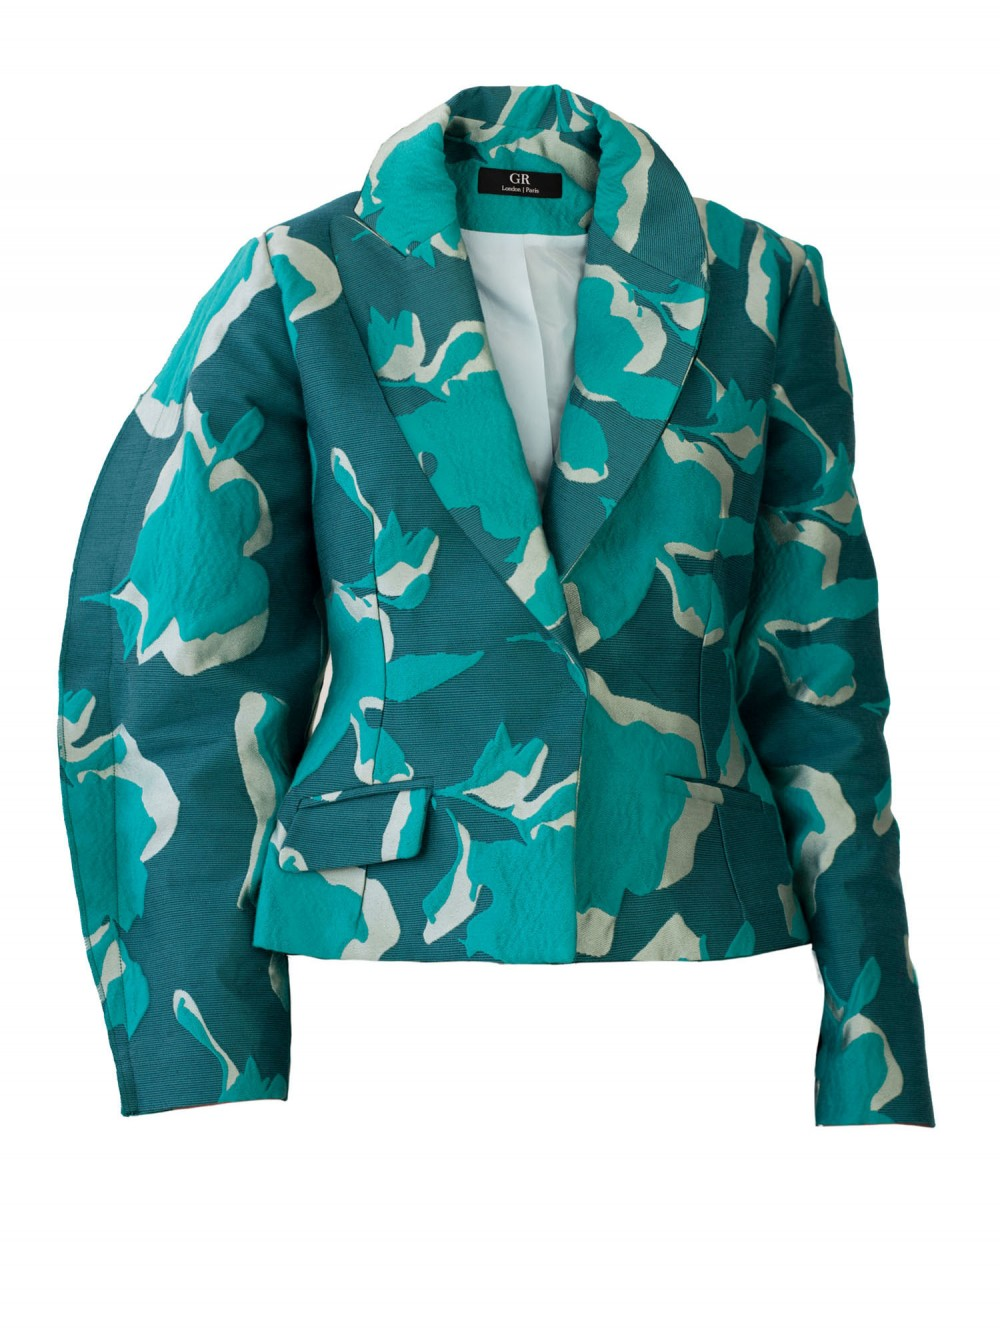 Floral Jacket   LO.NE.L.I.N.E.S.S